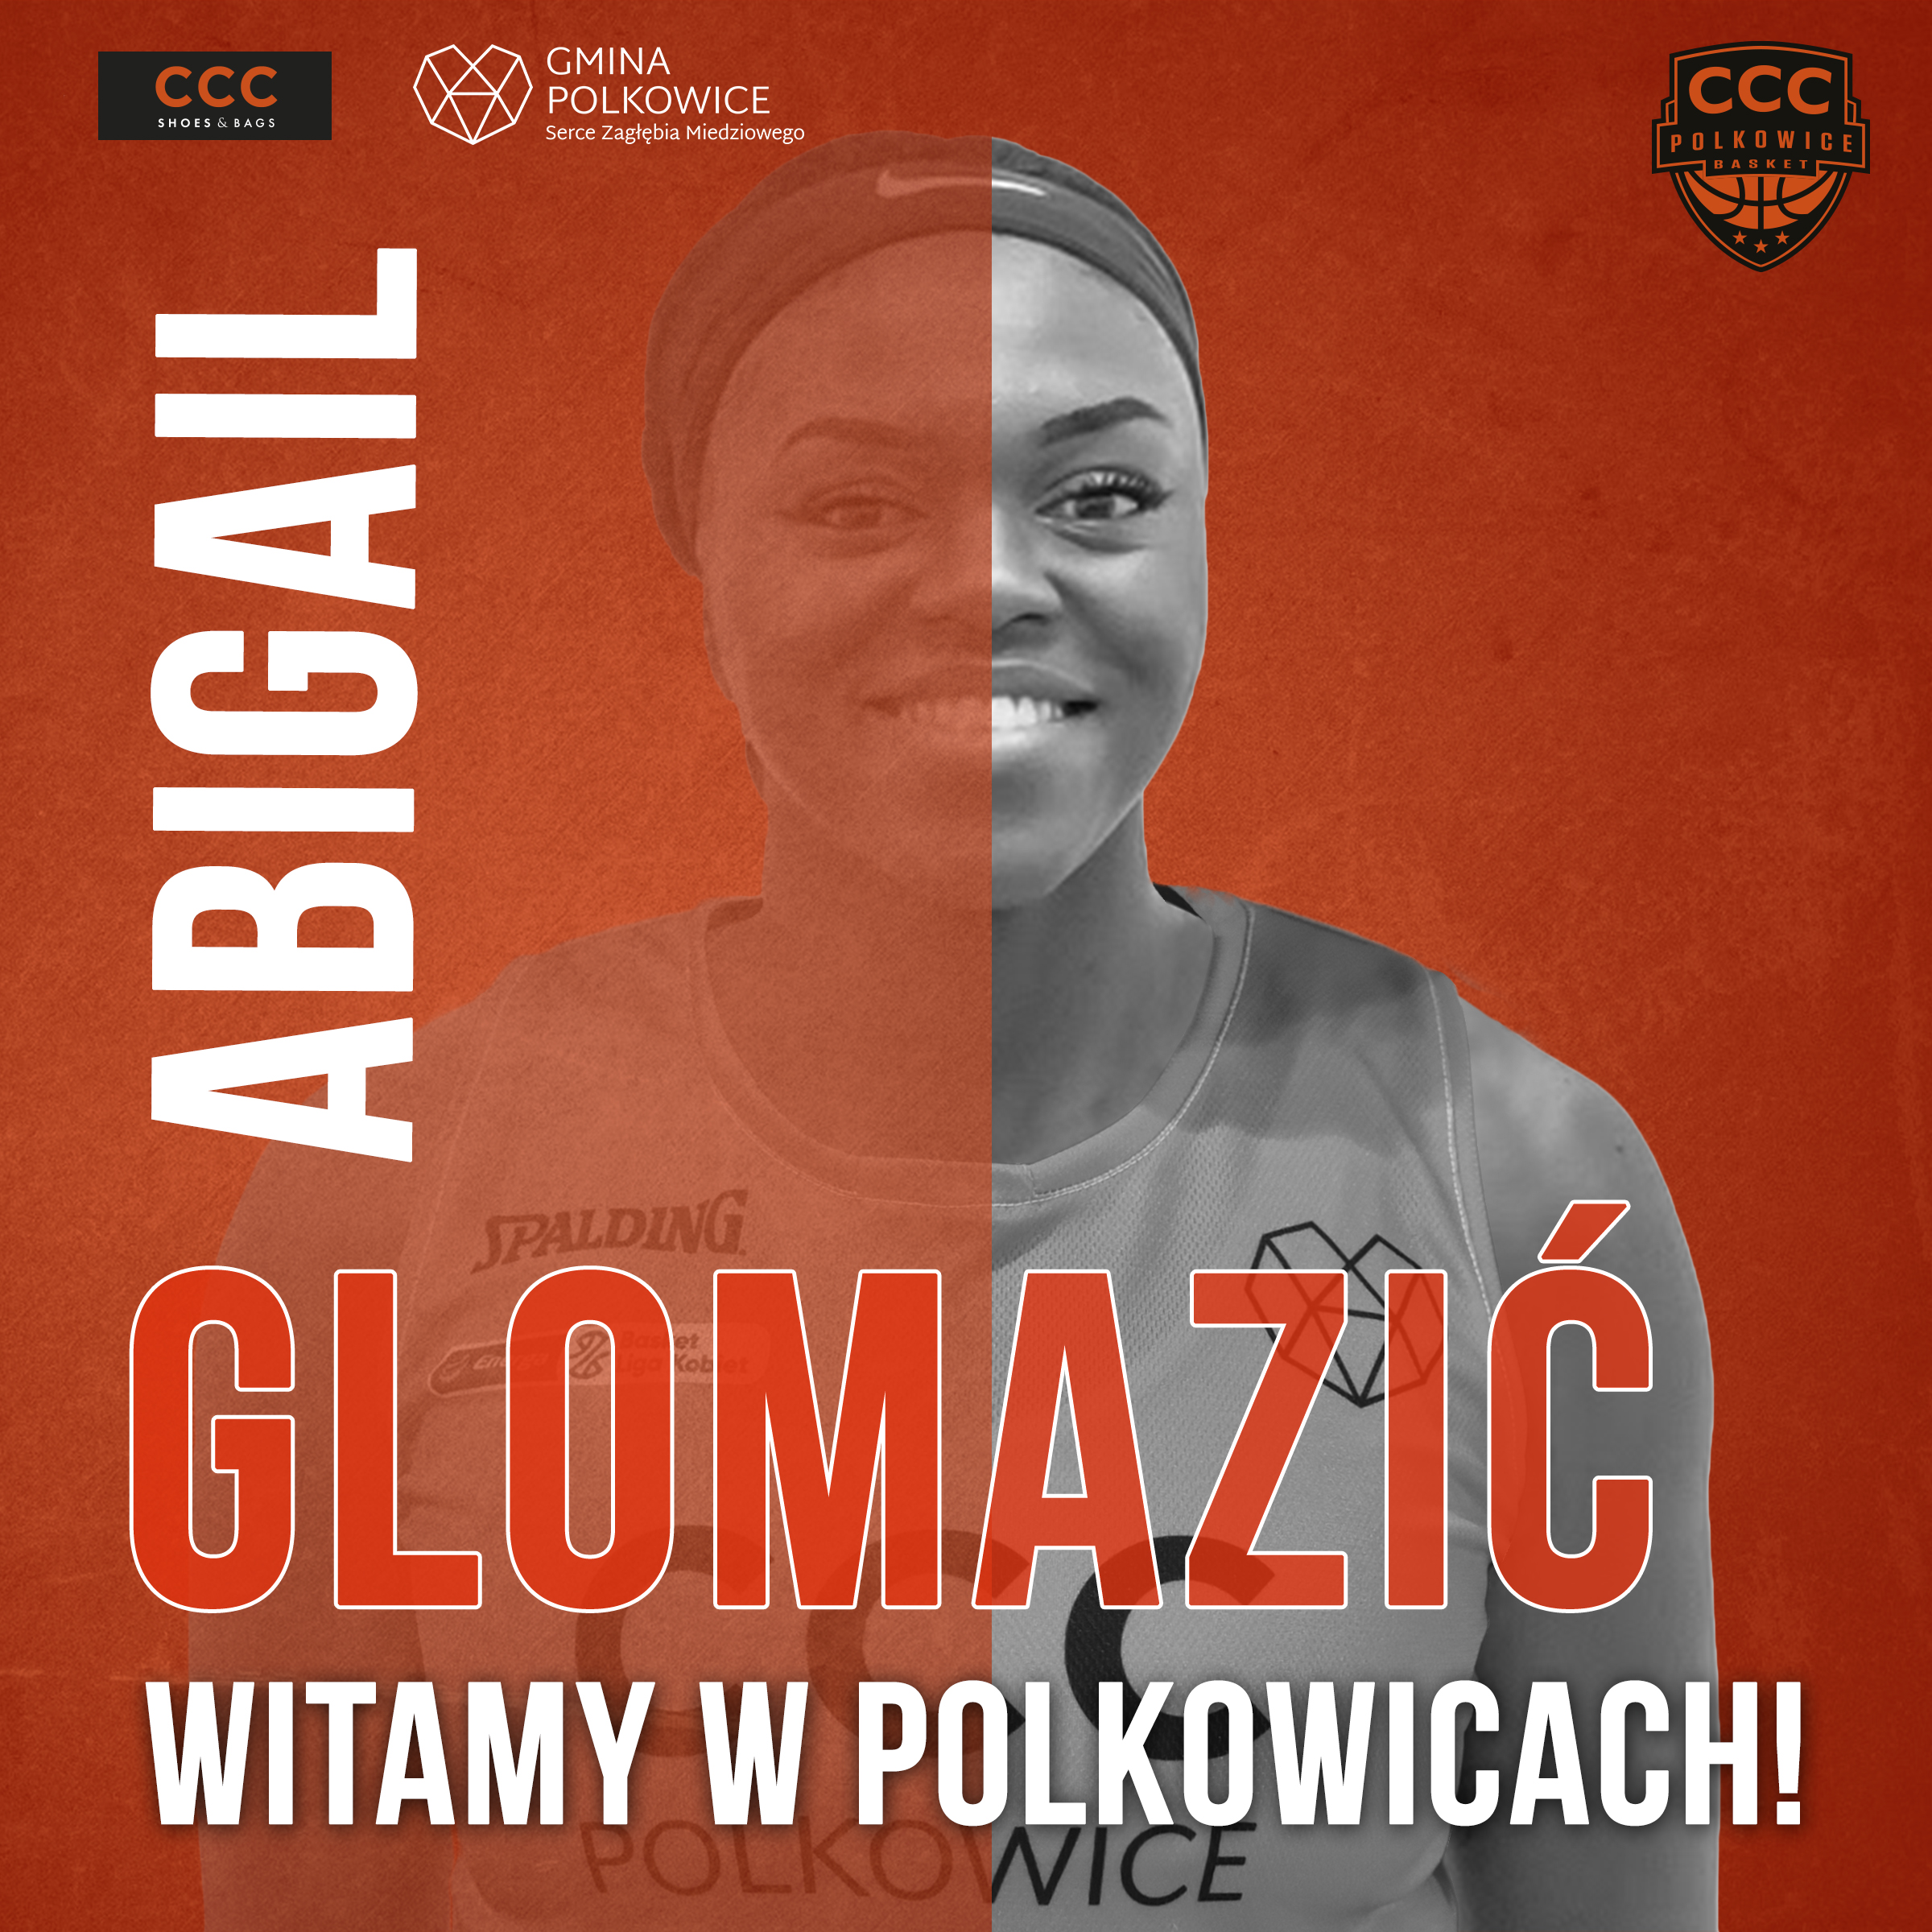 Abigail Glomazic